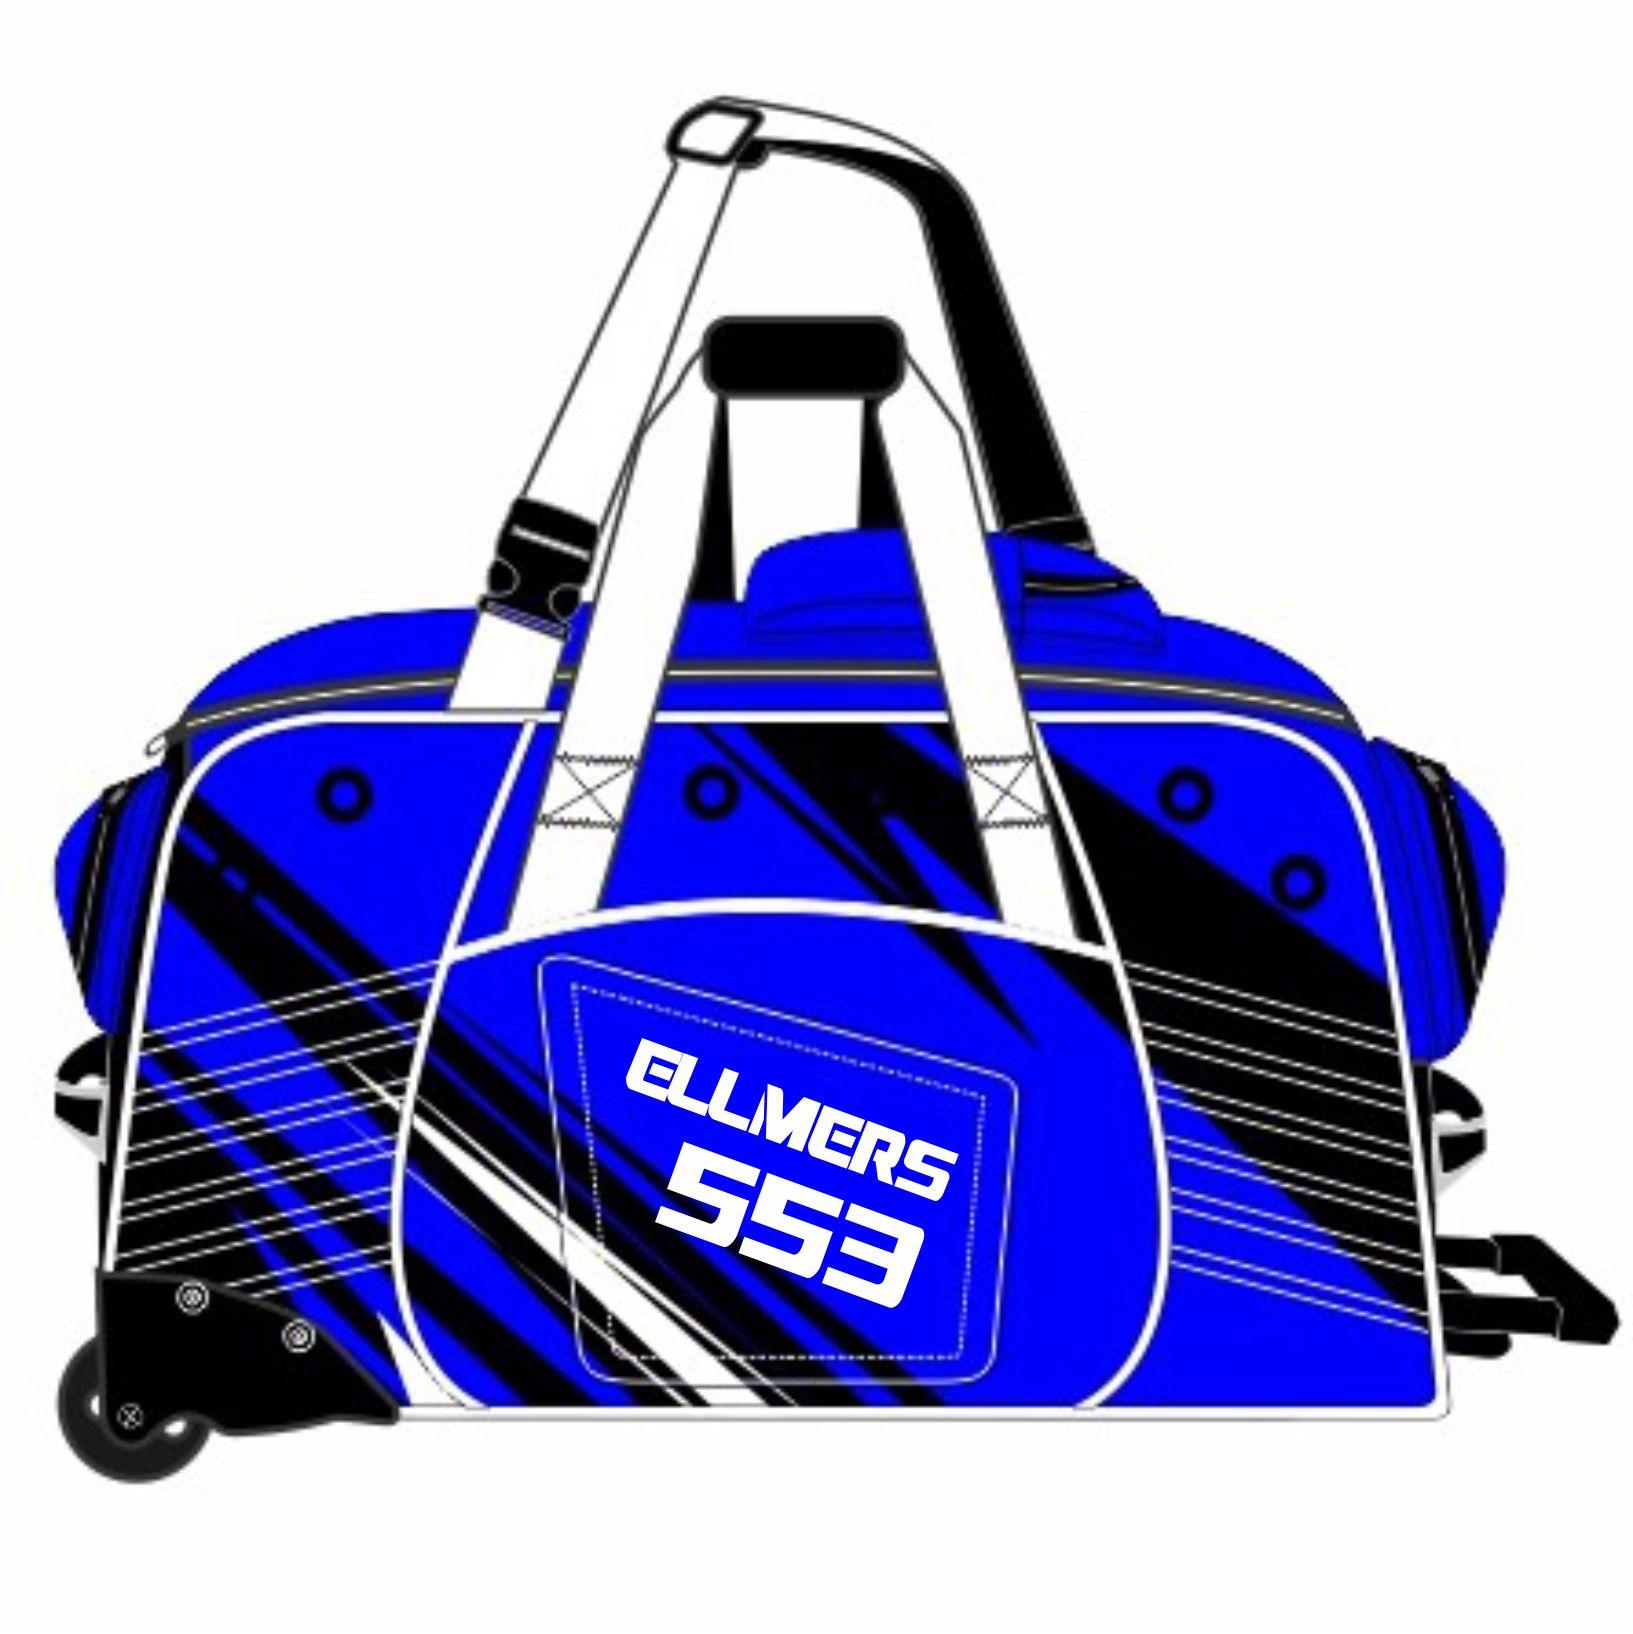 plate-example-rolling-gear-bags-2019.jpg